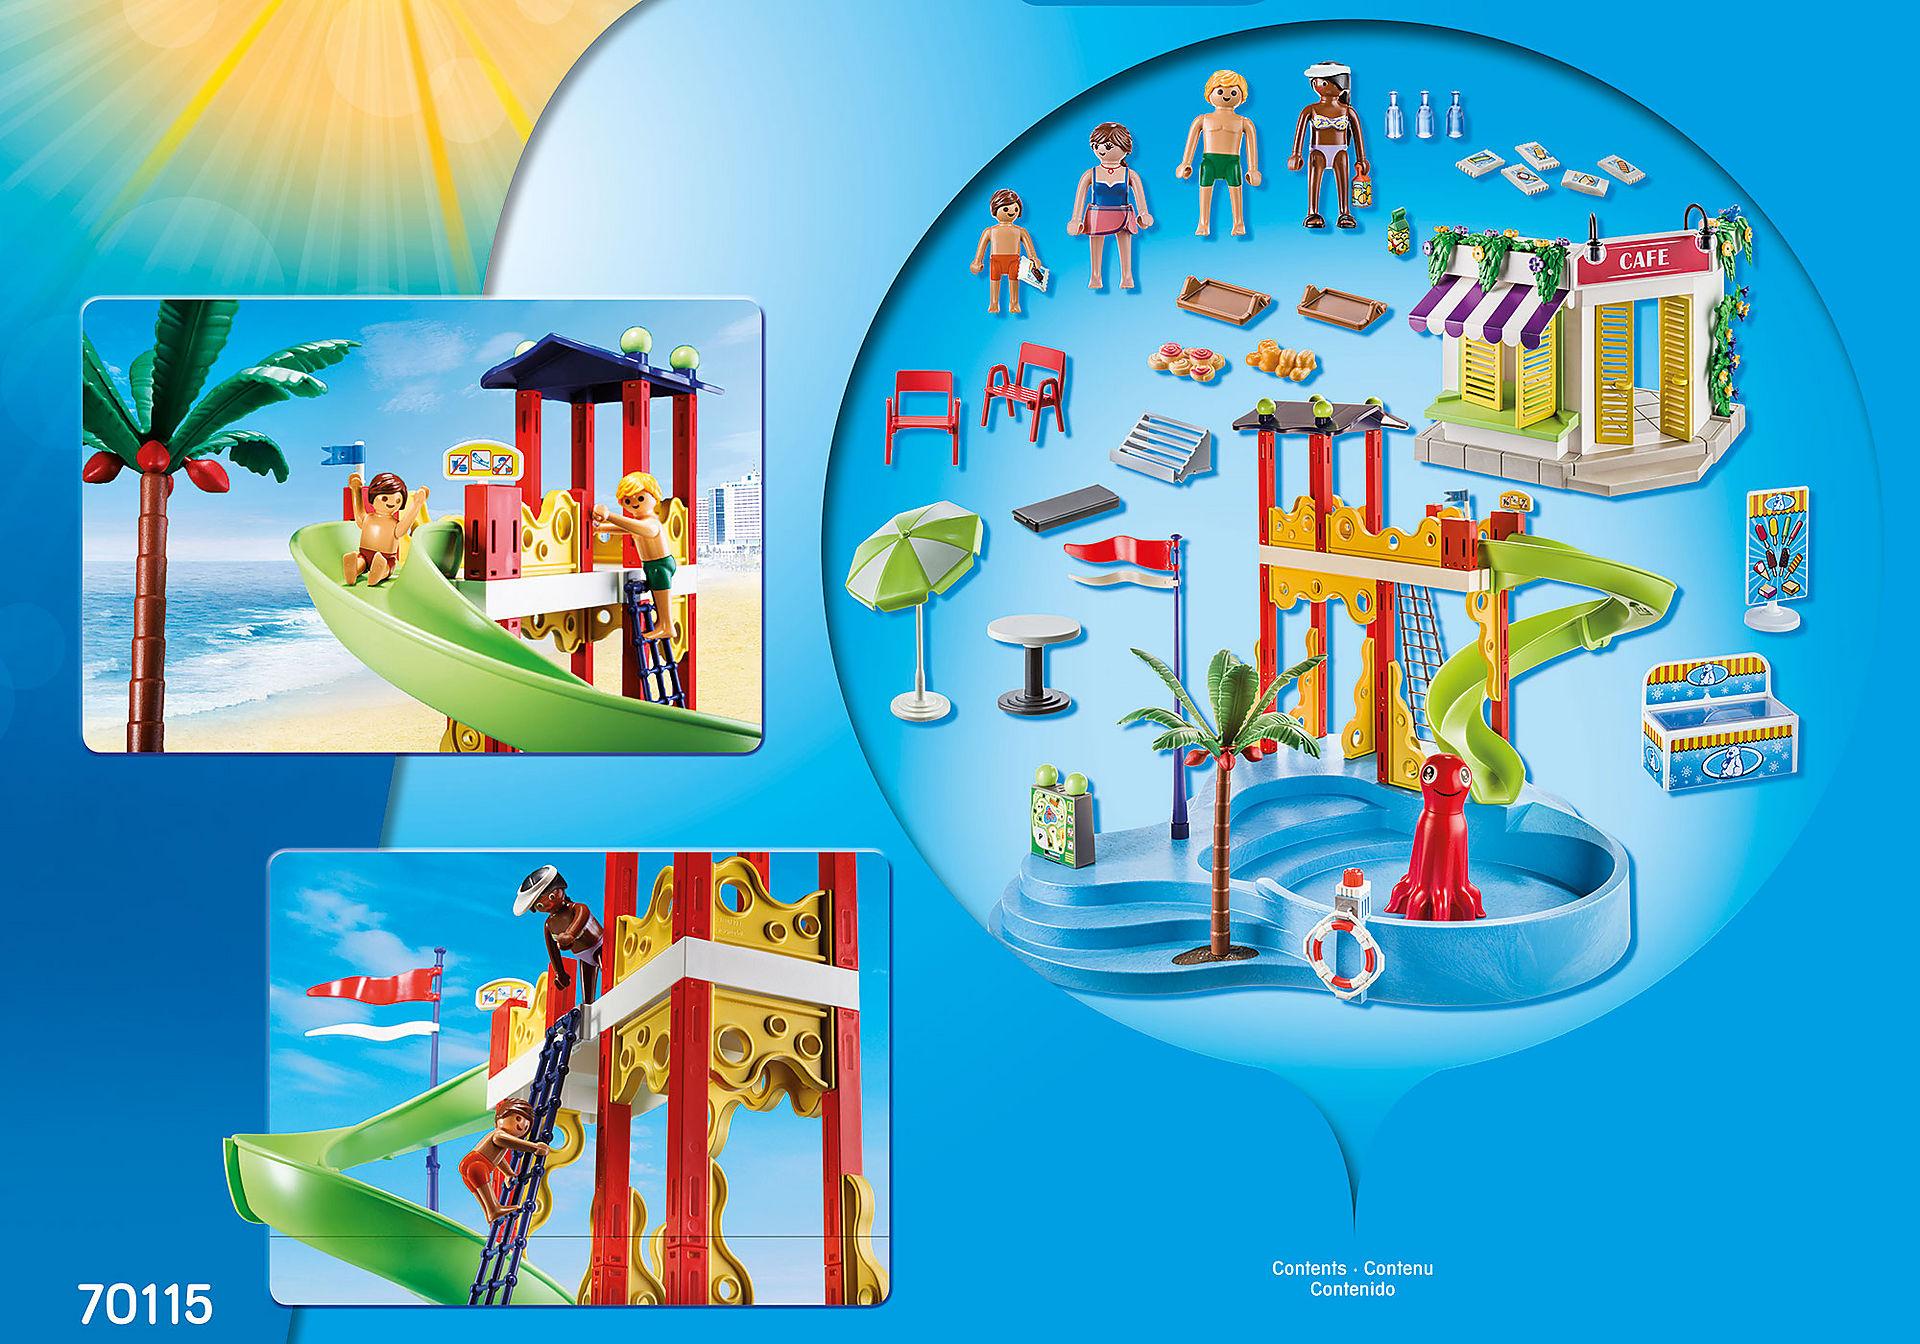 70115 Parc aquatique zoom image3